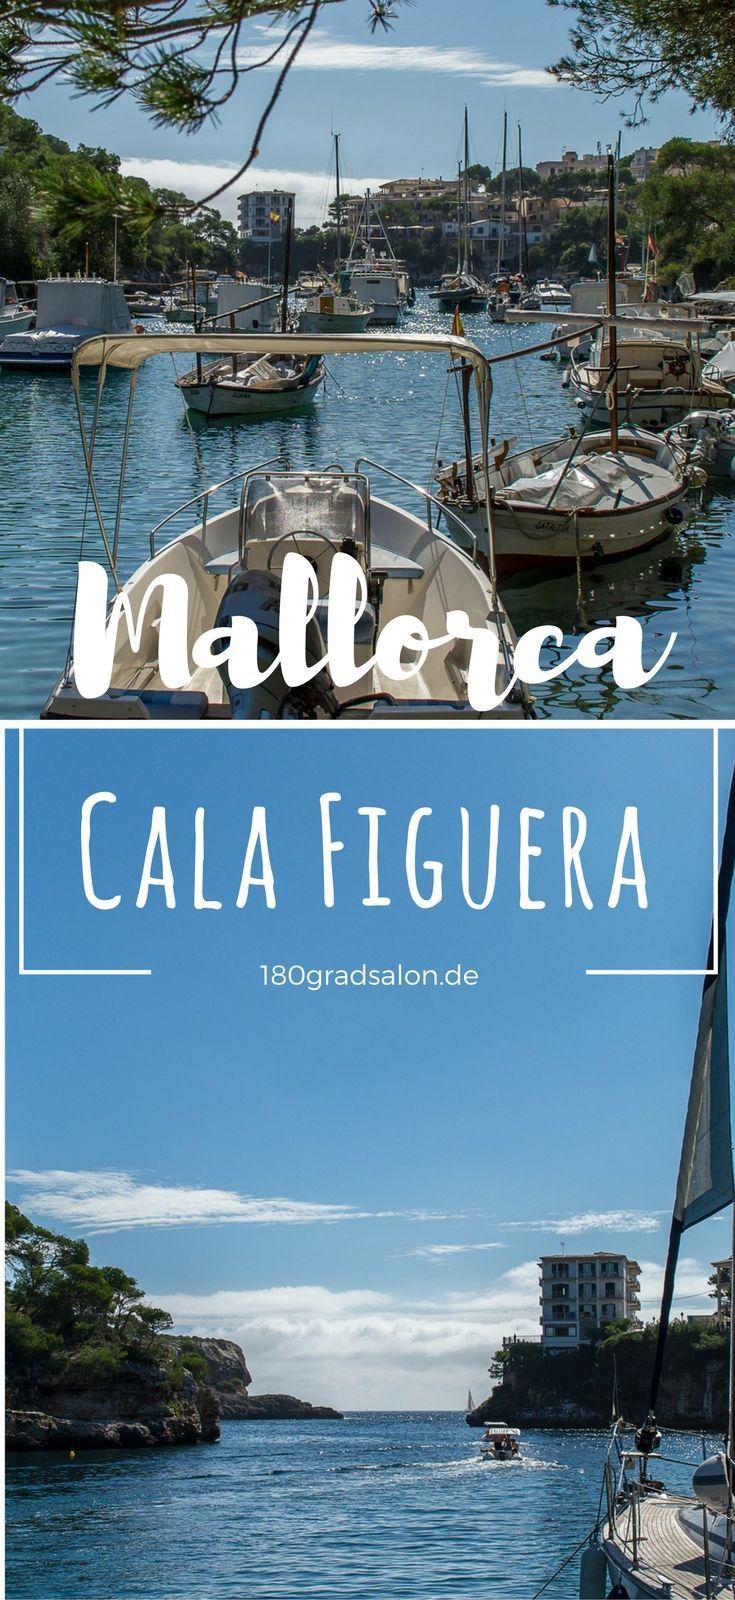 Cala Figuera auf Mallorca und das Restaurant Pura Vida